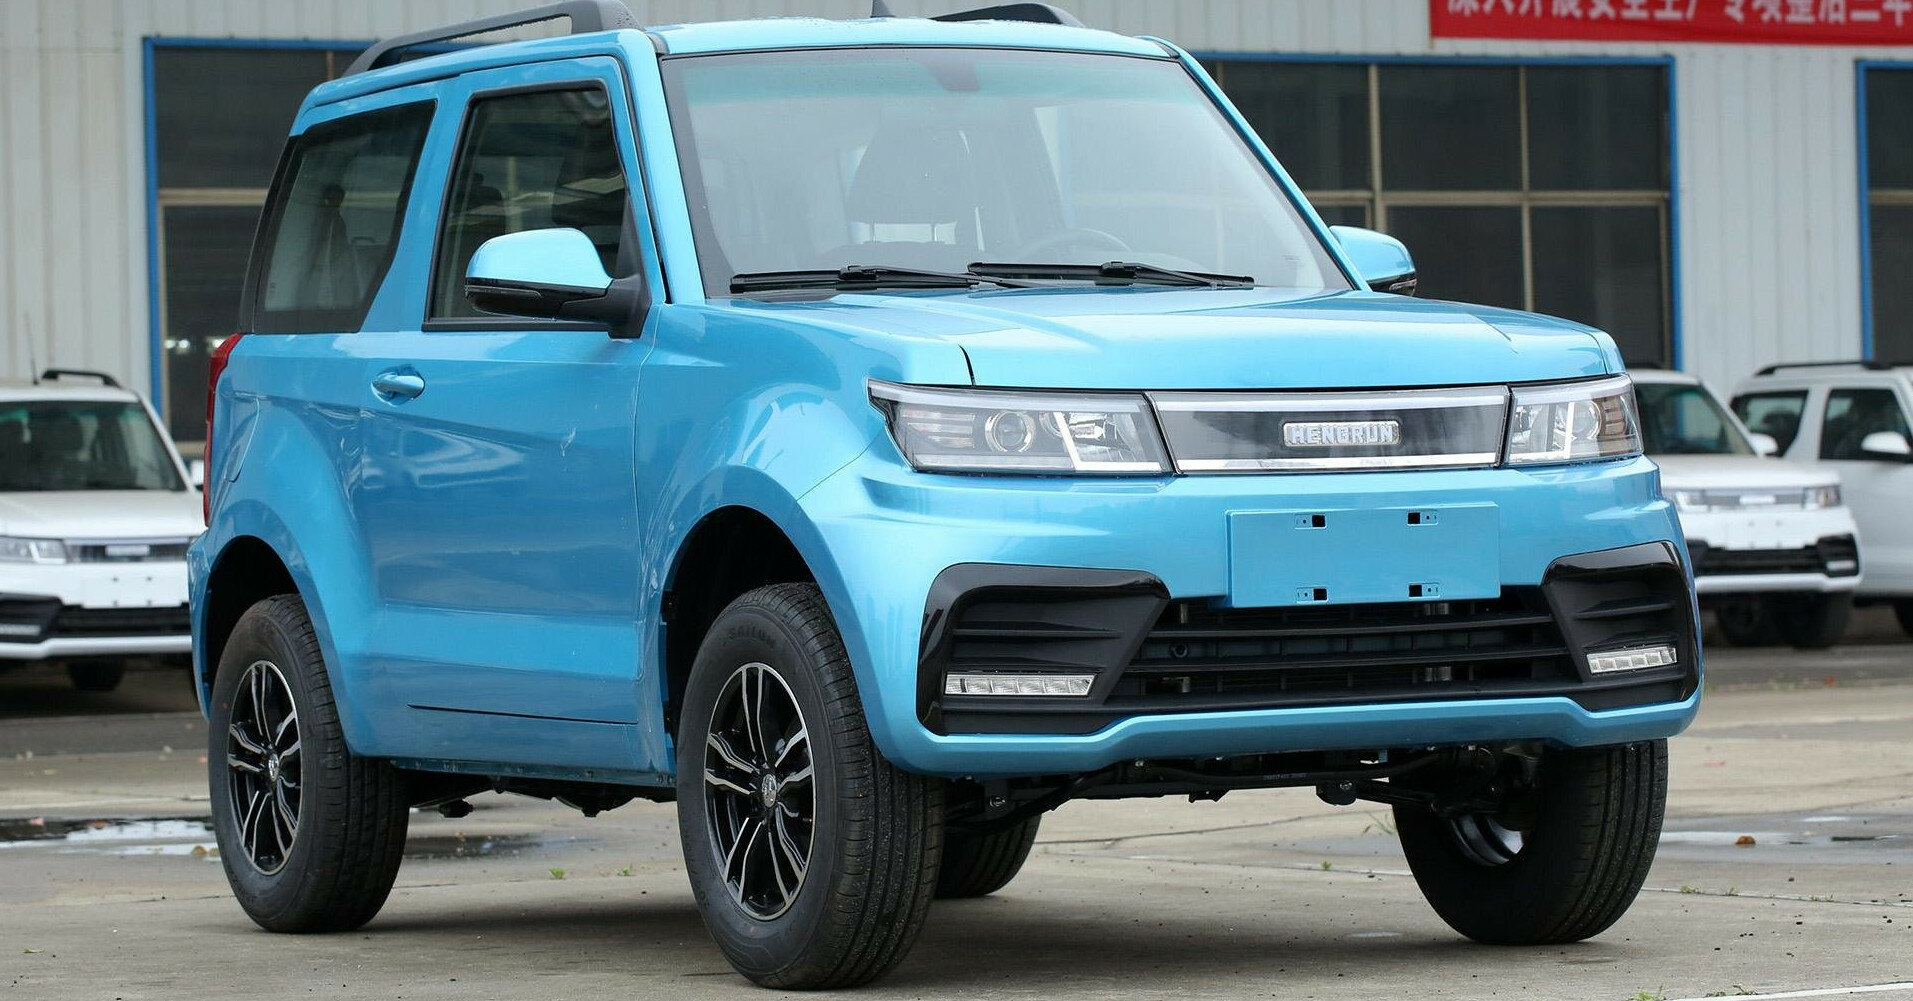 Китайцы показали дешевую альтернативу Suzuki Jimny